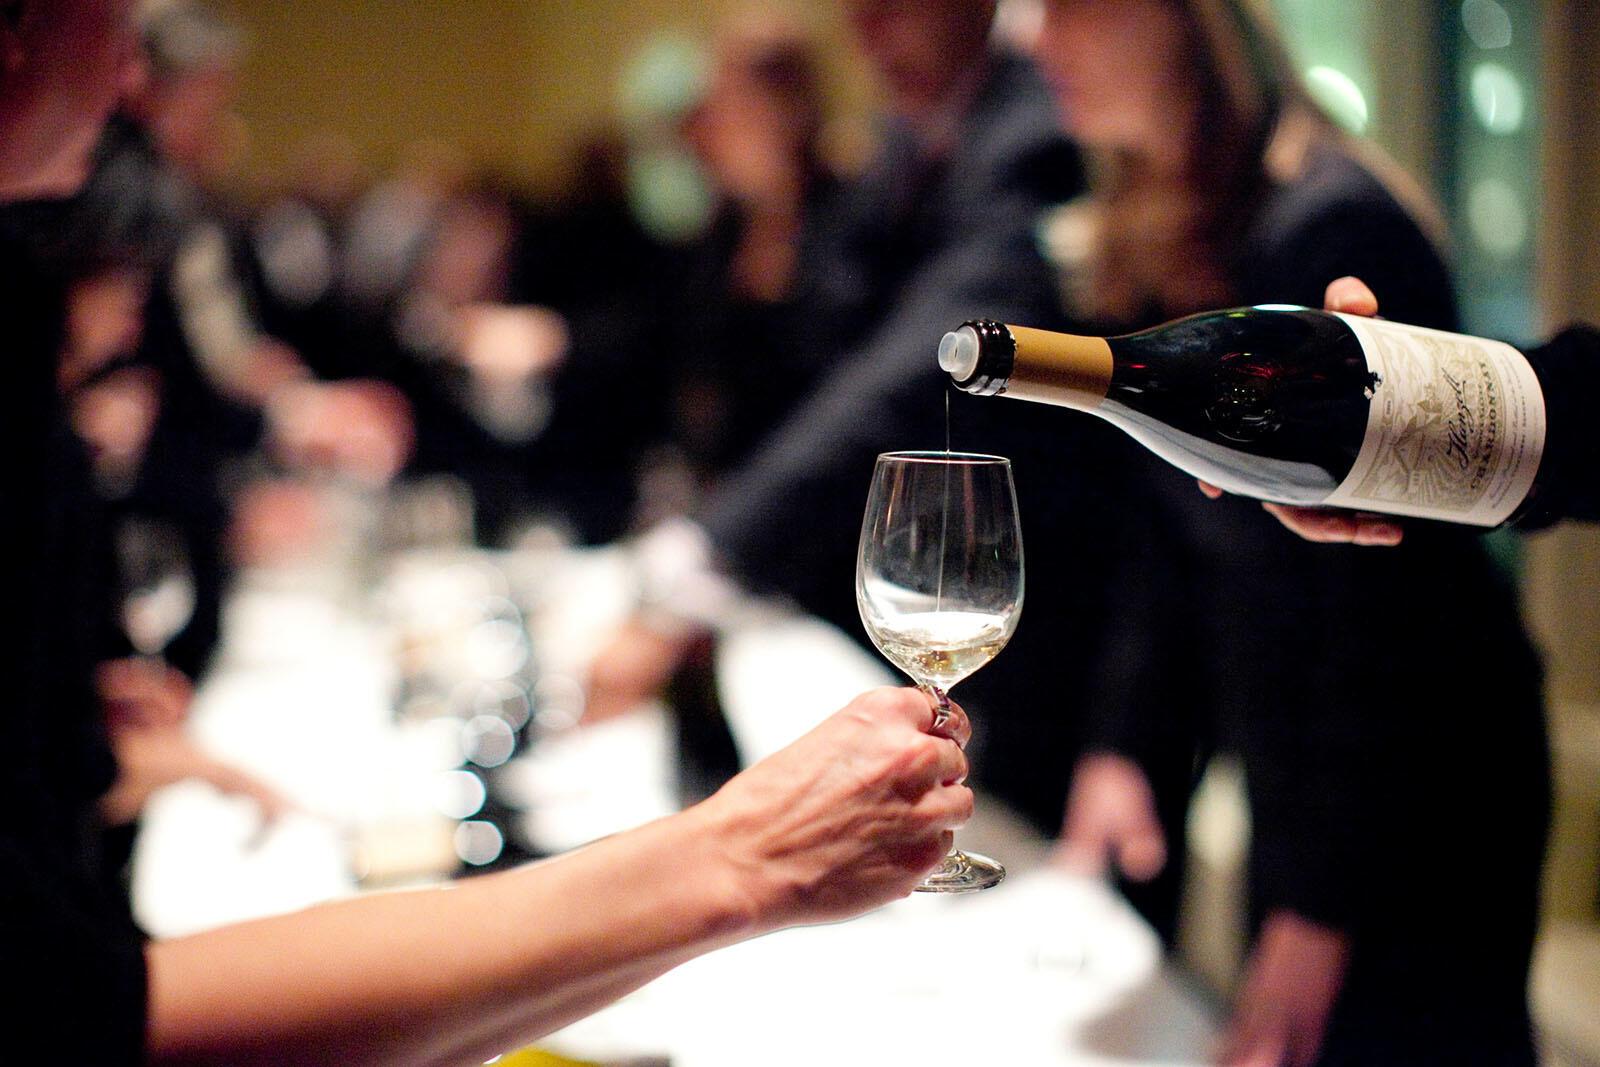 Server pouring wine